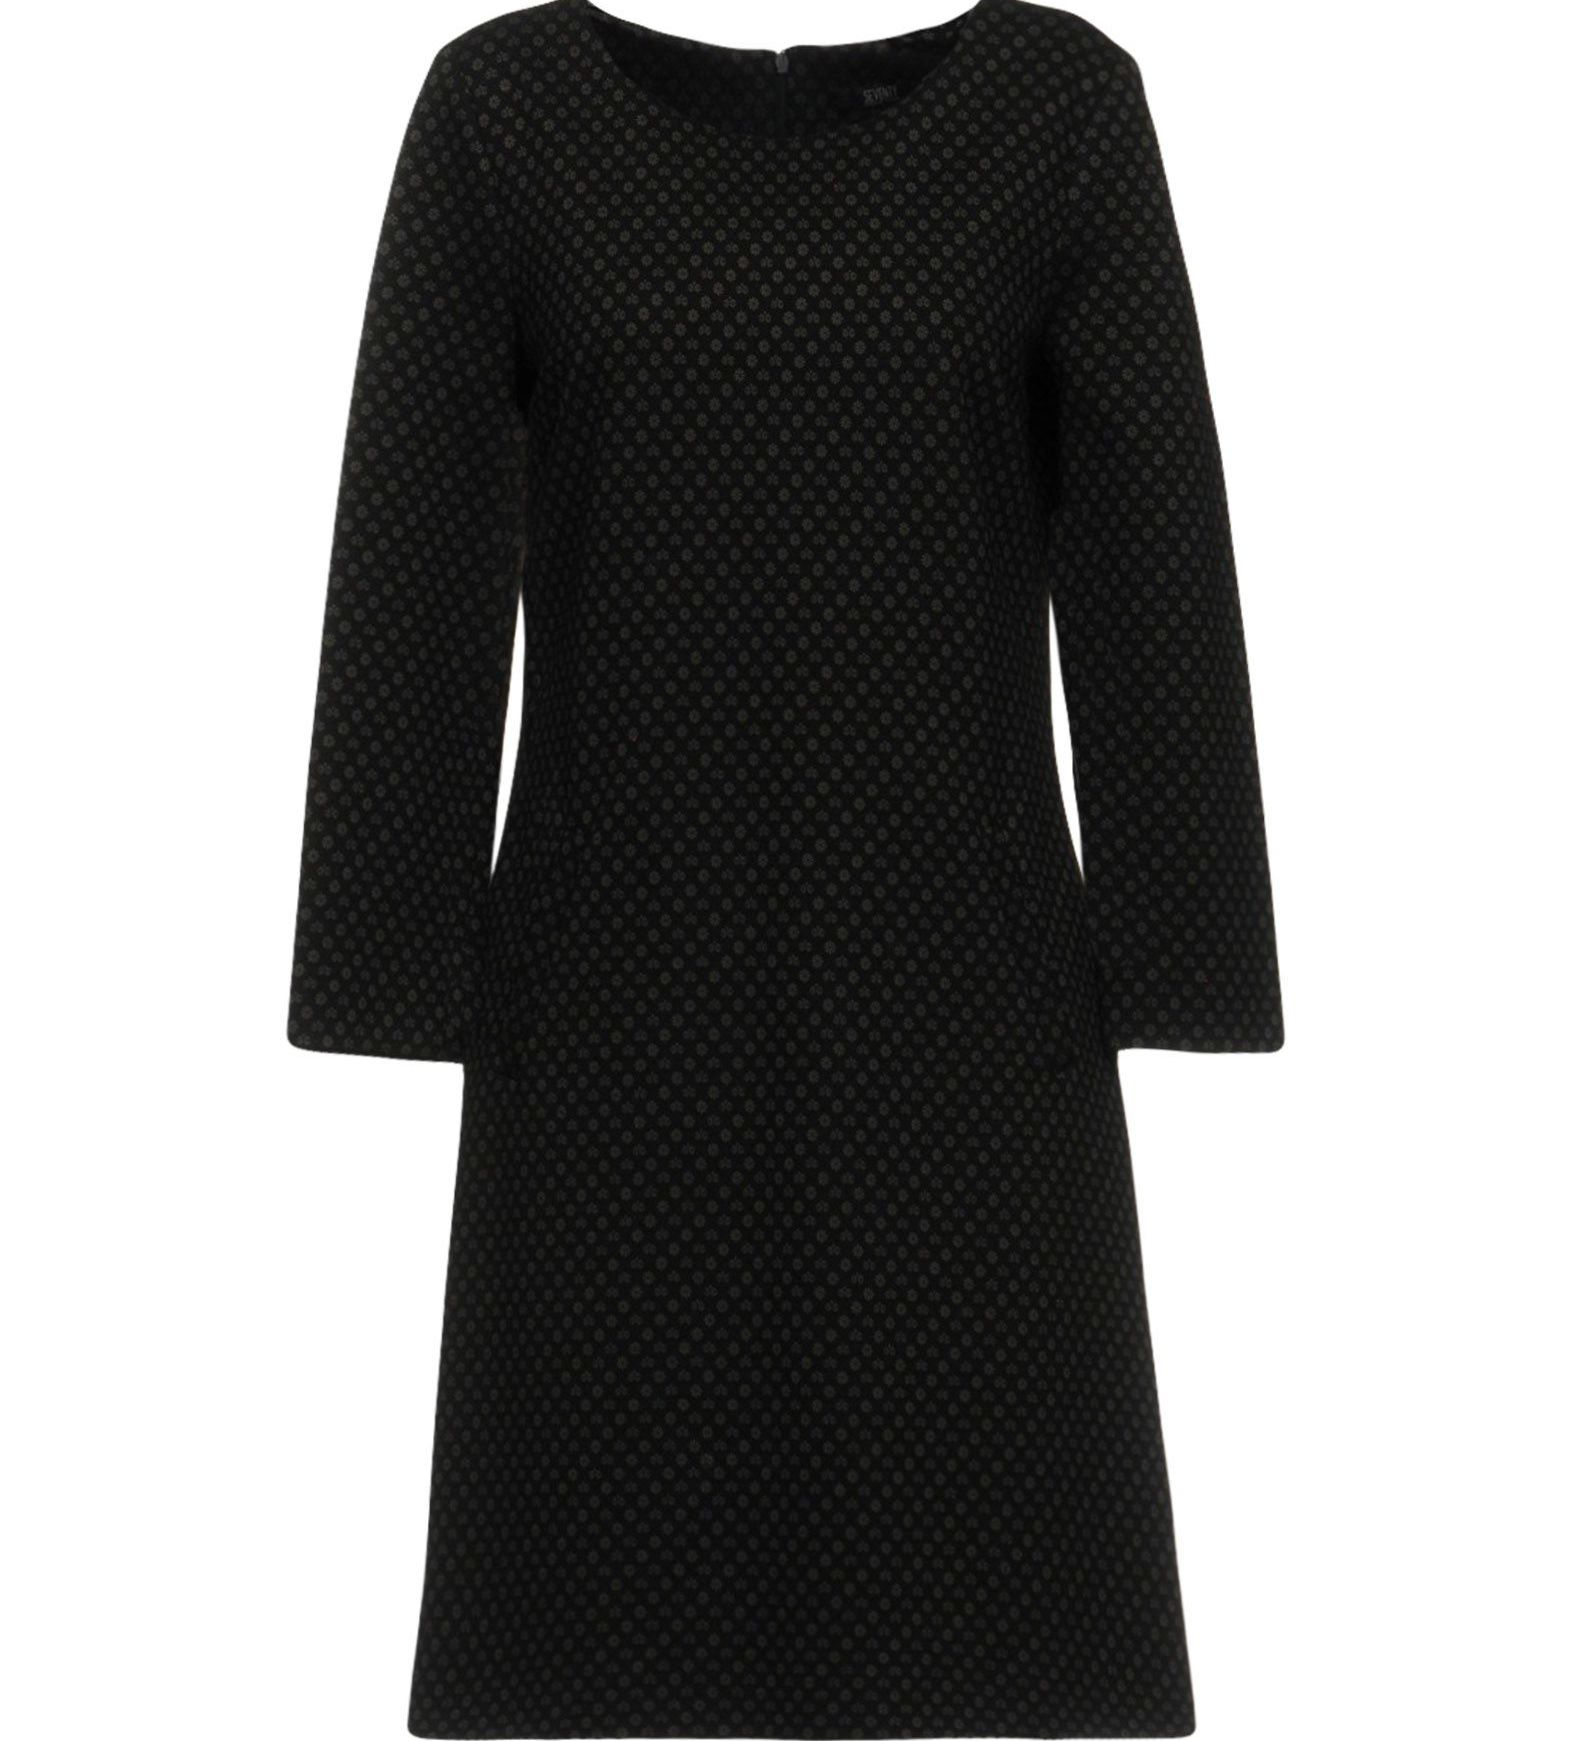 SEVENTY SERGIO TEGON ΦΟΡΕΜΑΤΑ Κοντό φόρεμα